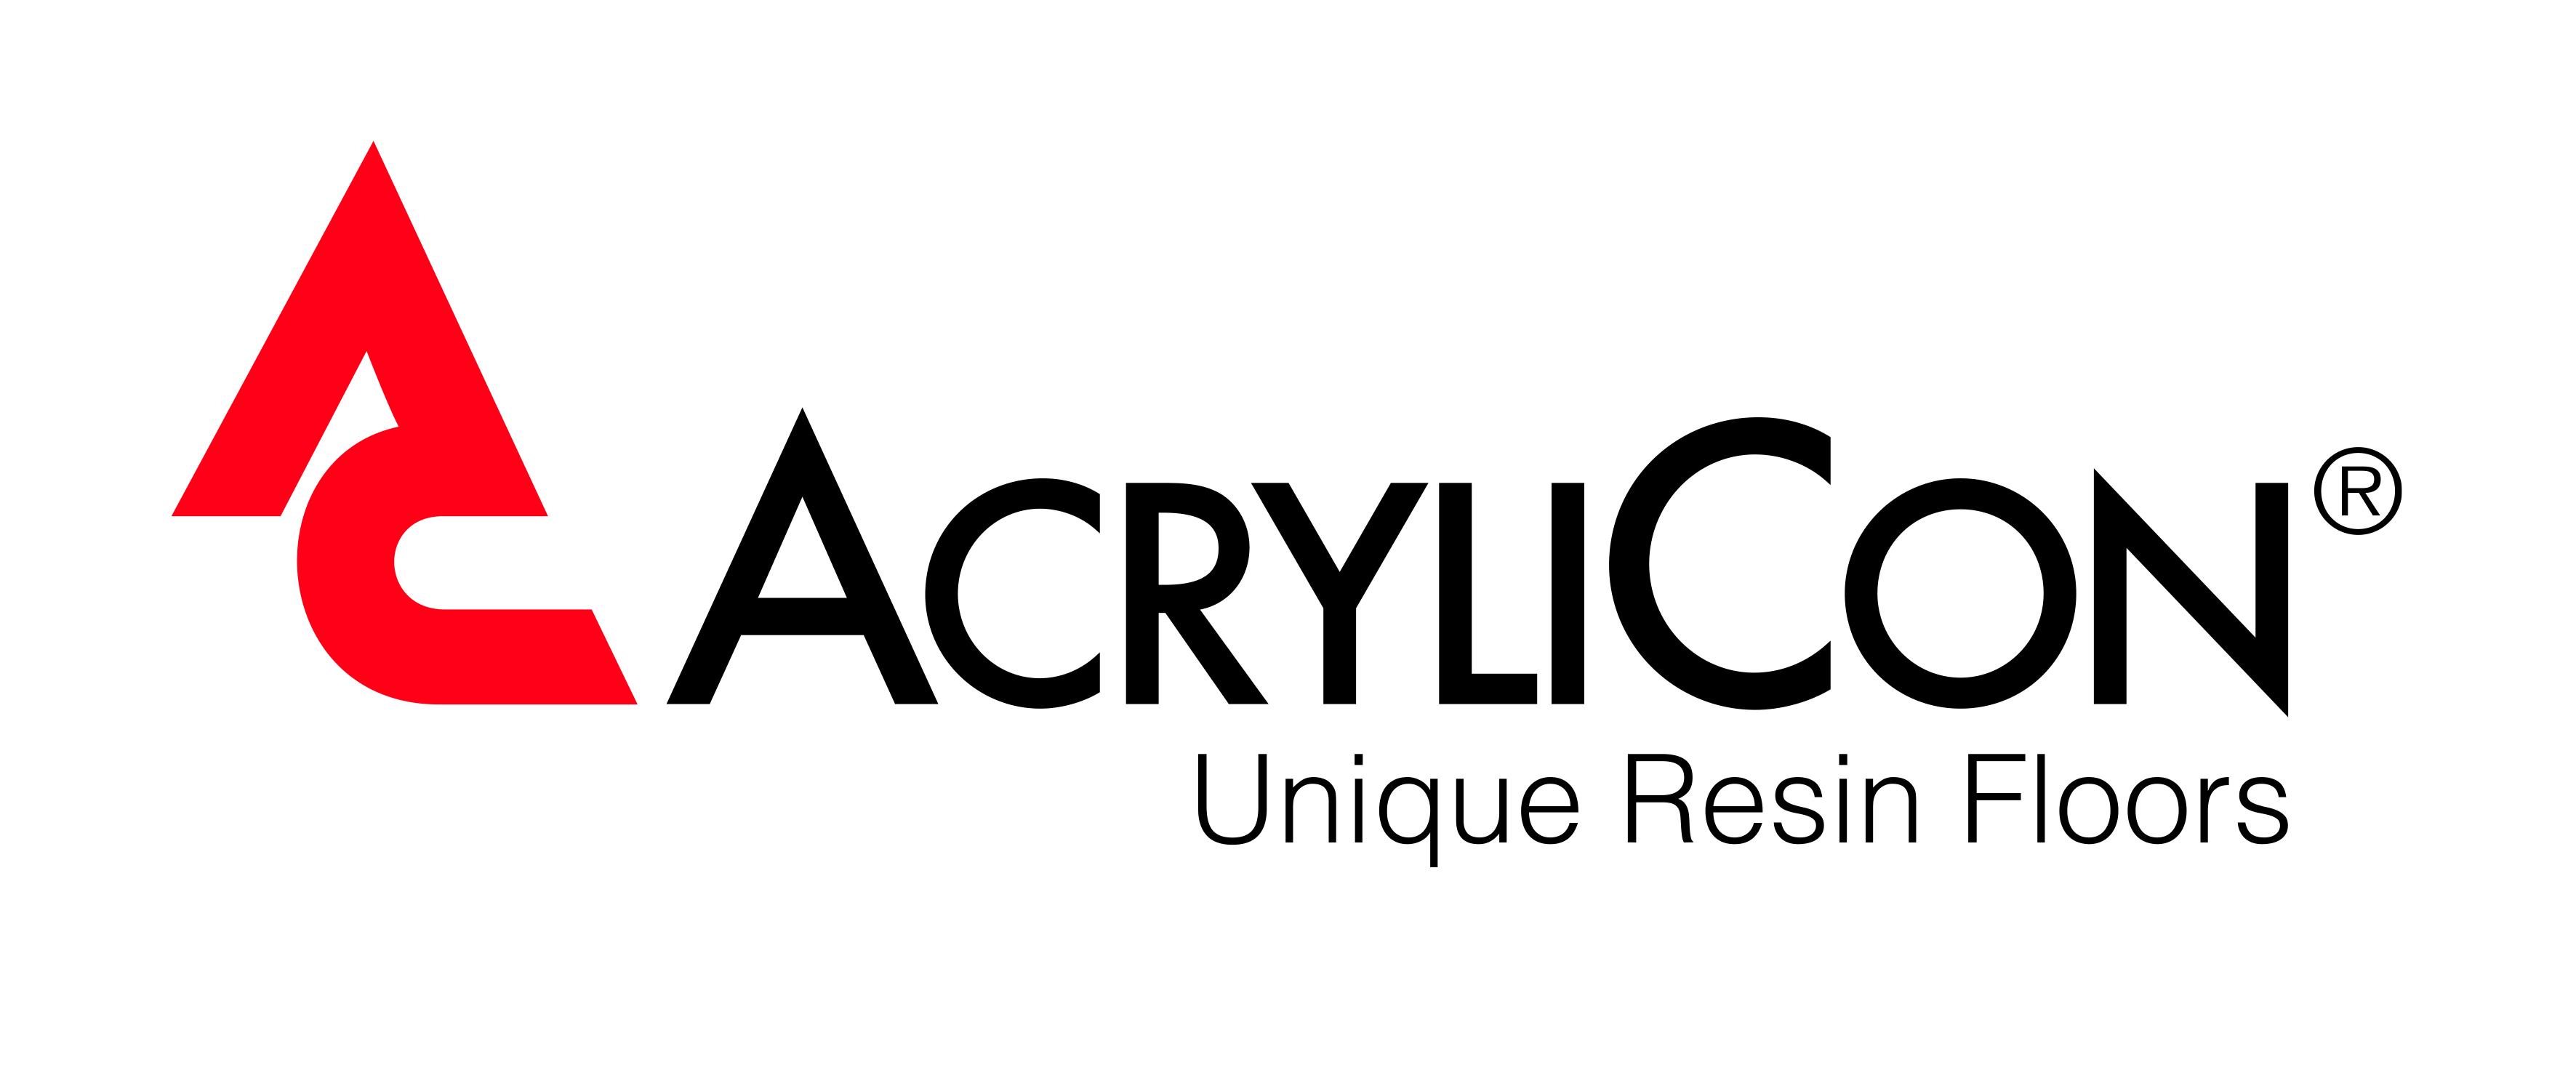 Acrylicon Brand URF High